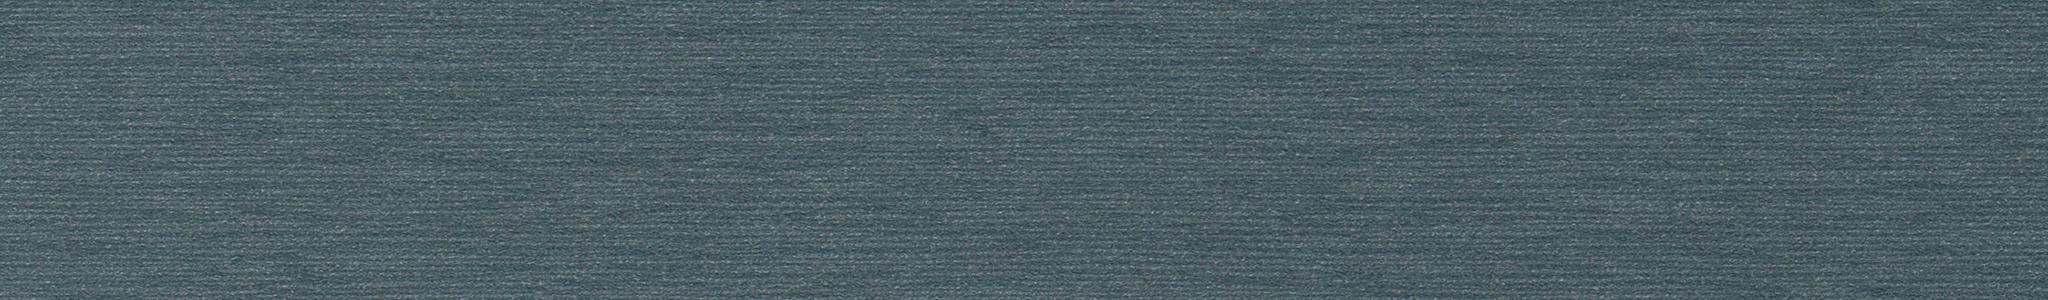 HD 29462 ABS hrana metalika modrá indigo perla